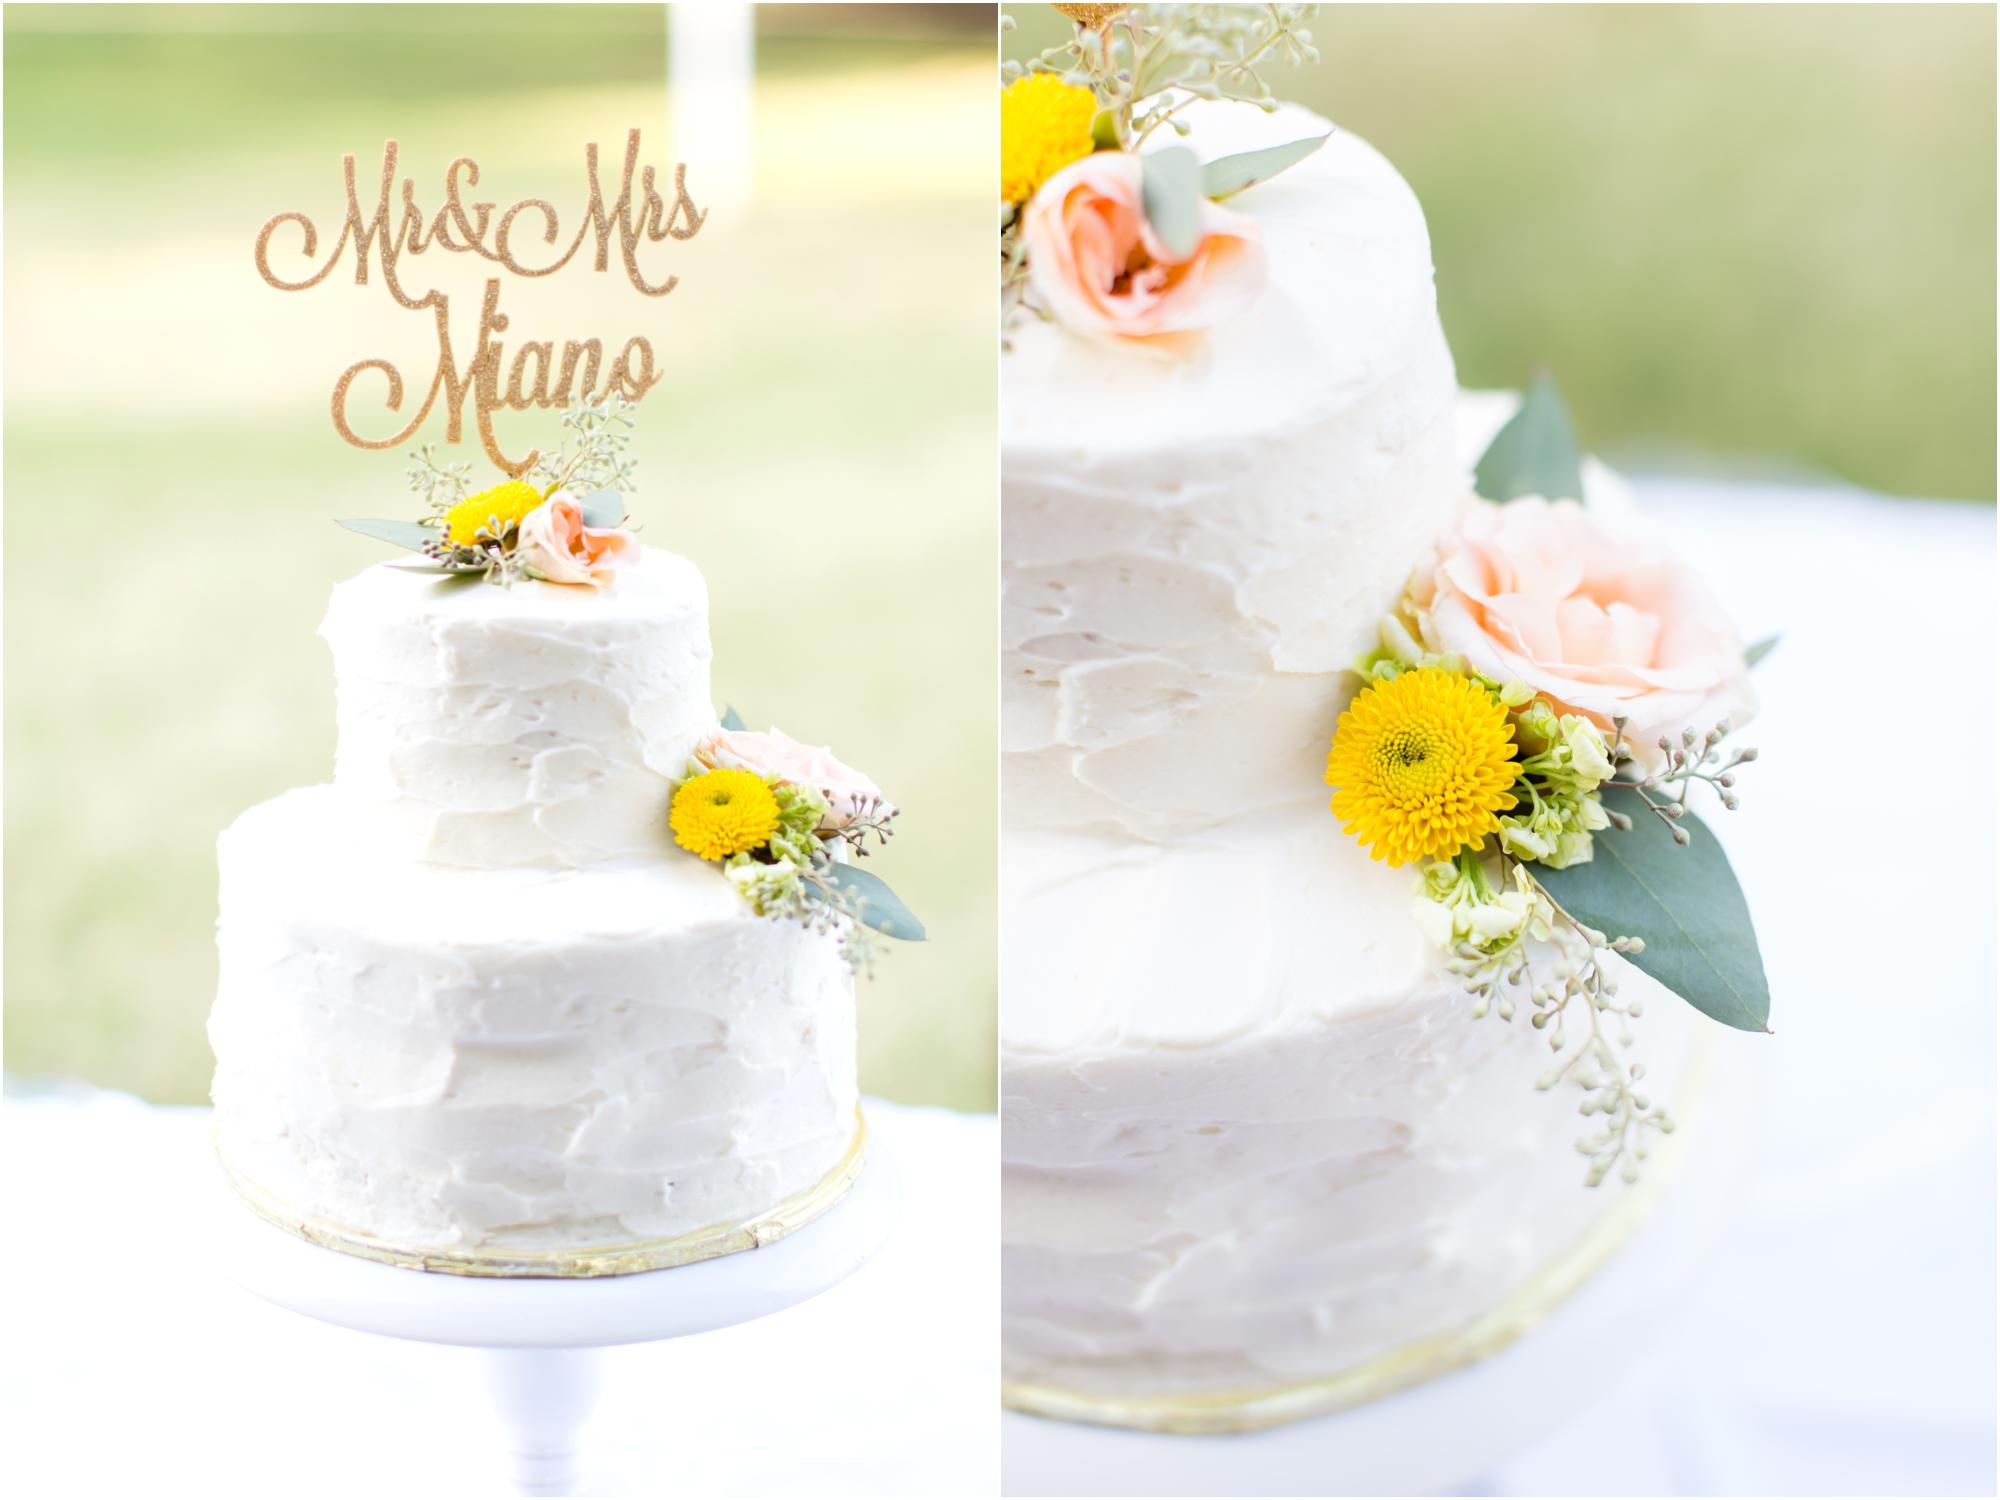 7-Miano Wedding Reception-733_anna grace photography maryland wedding photographer rockland estates.jpg